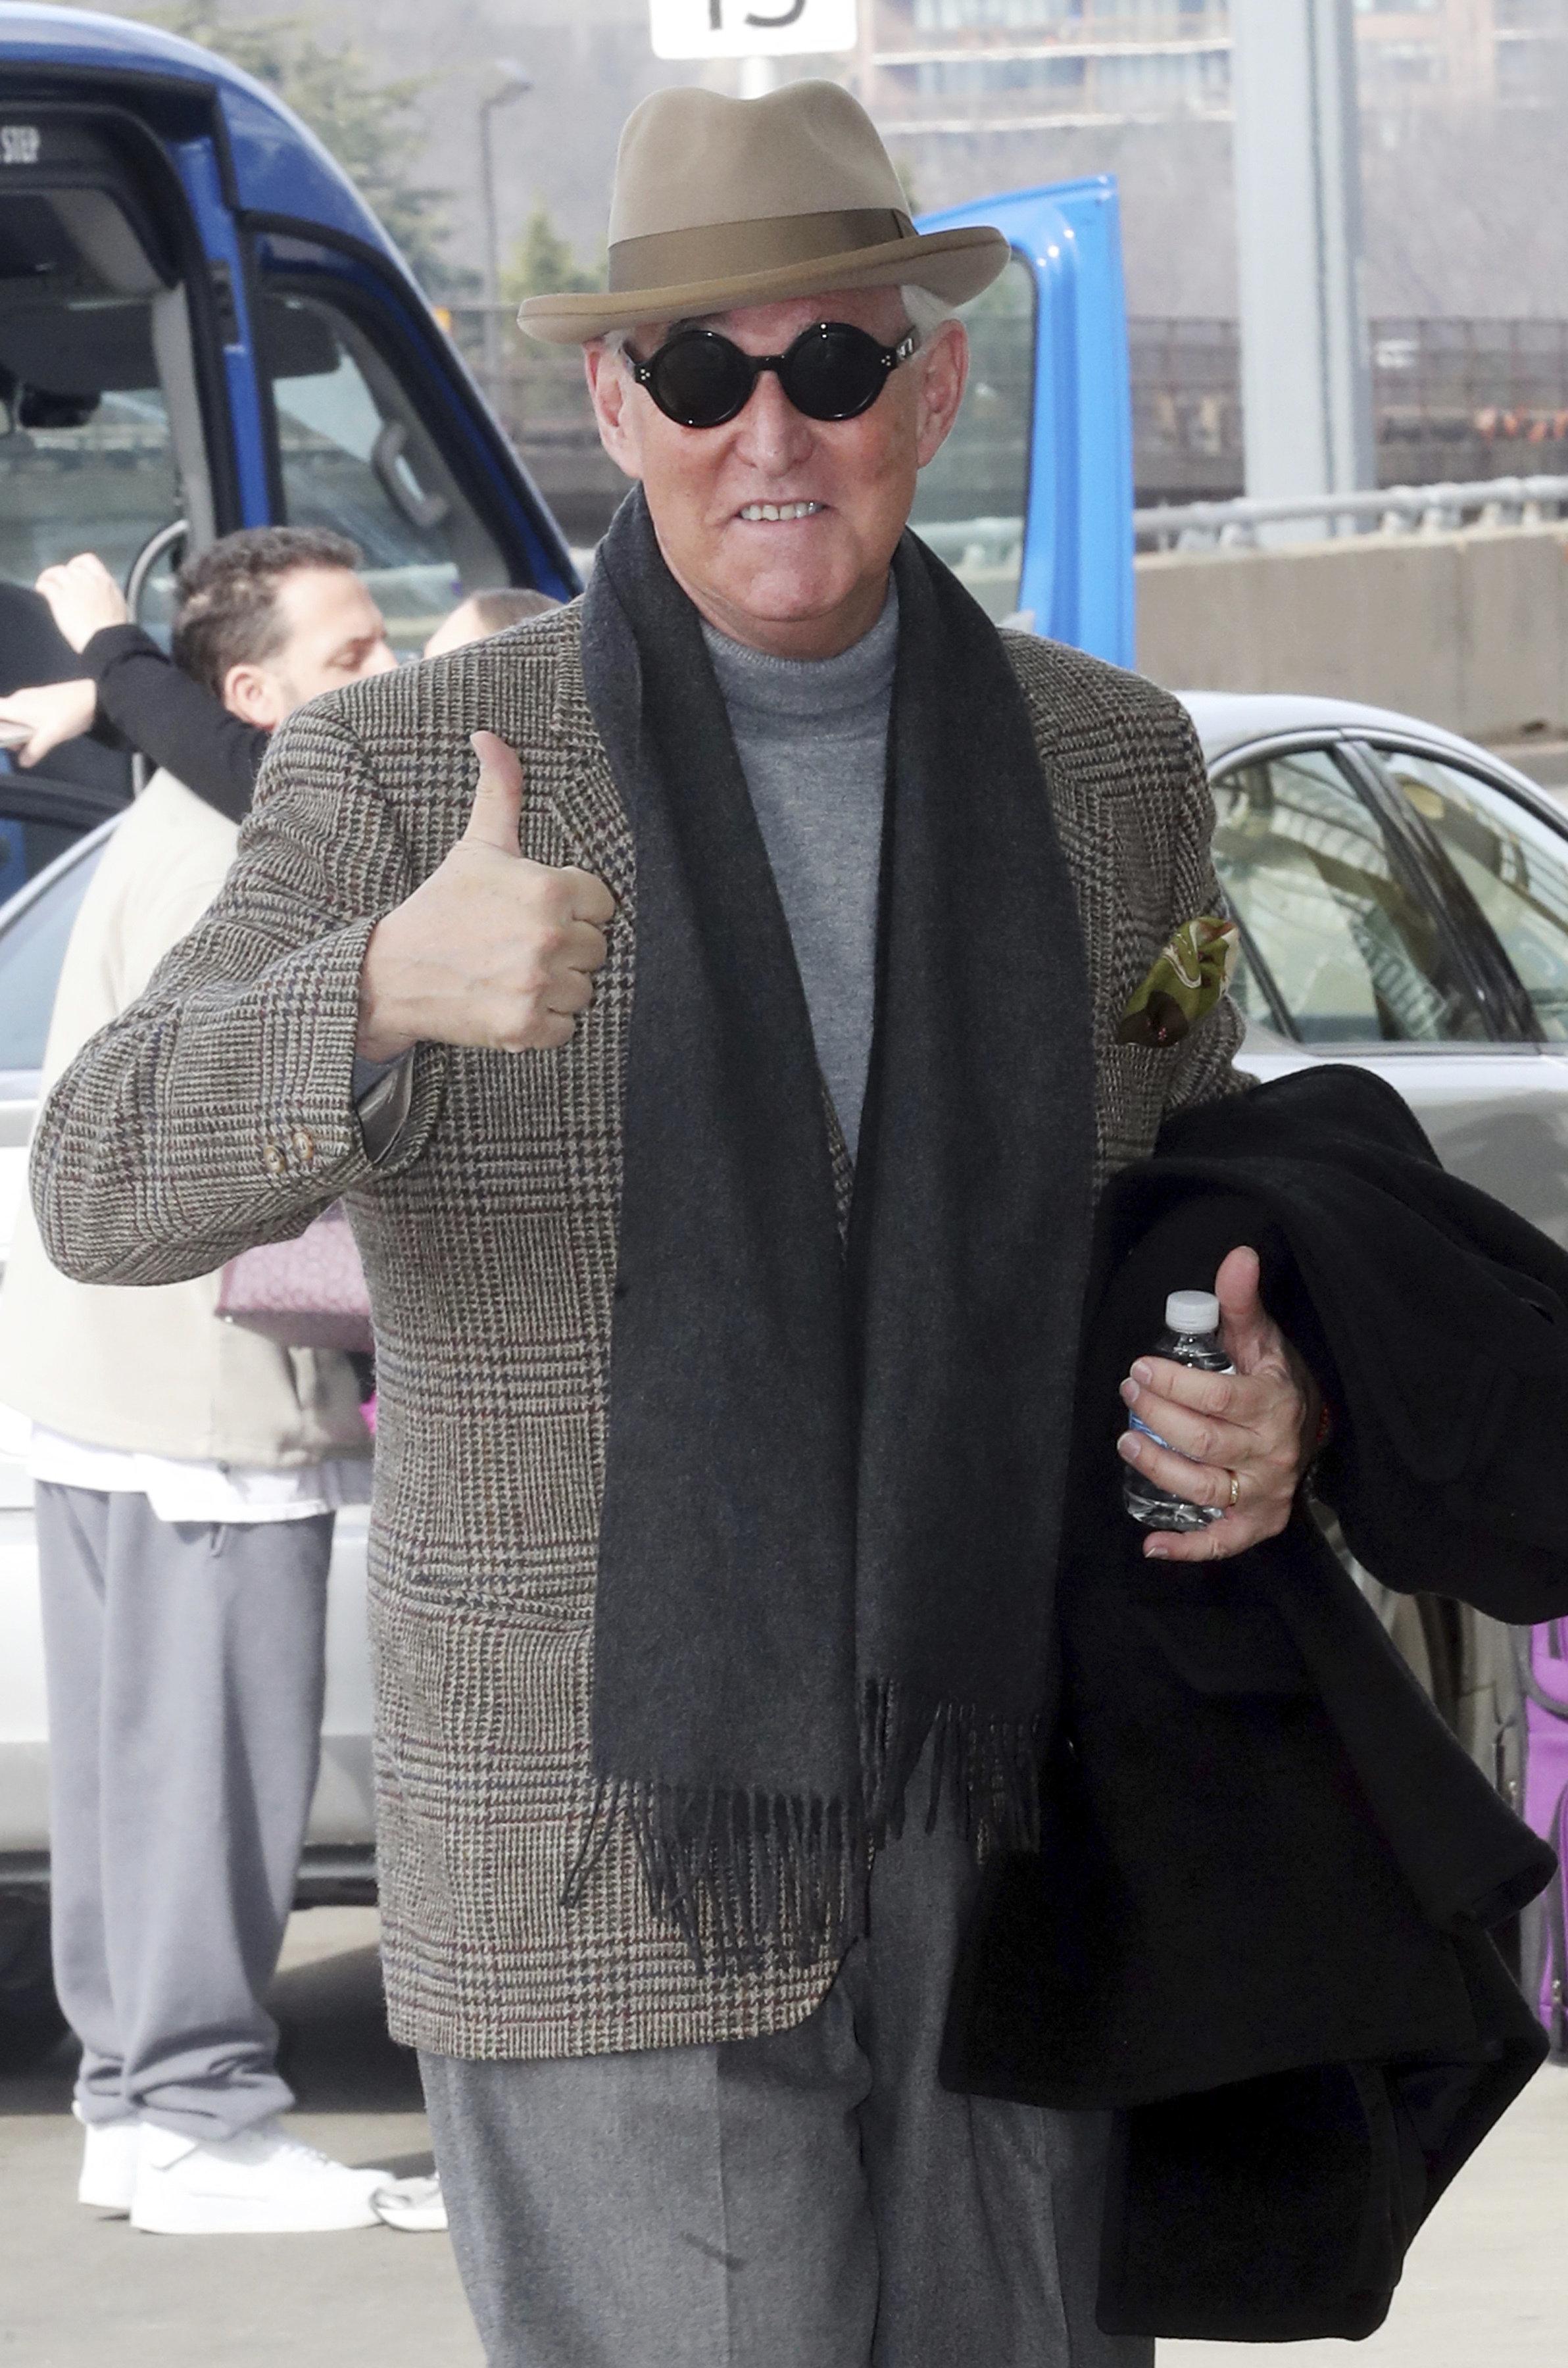 ARLINGTON, VA - FEBRUARY 3: Roger Stone seen arriving at Ronald Reagan Washington National Airport in Arlington, Virginia on his way to Boston on February 3, 2019. Credit: mpi34/MediaPunch /IPX